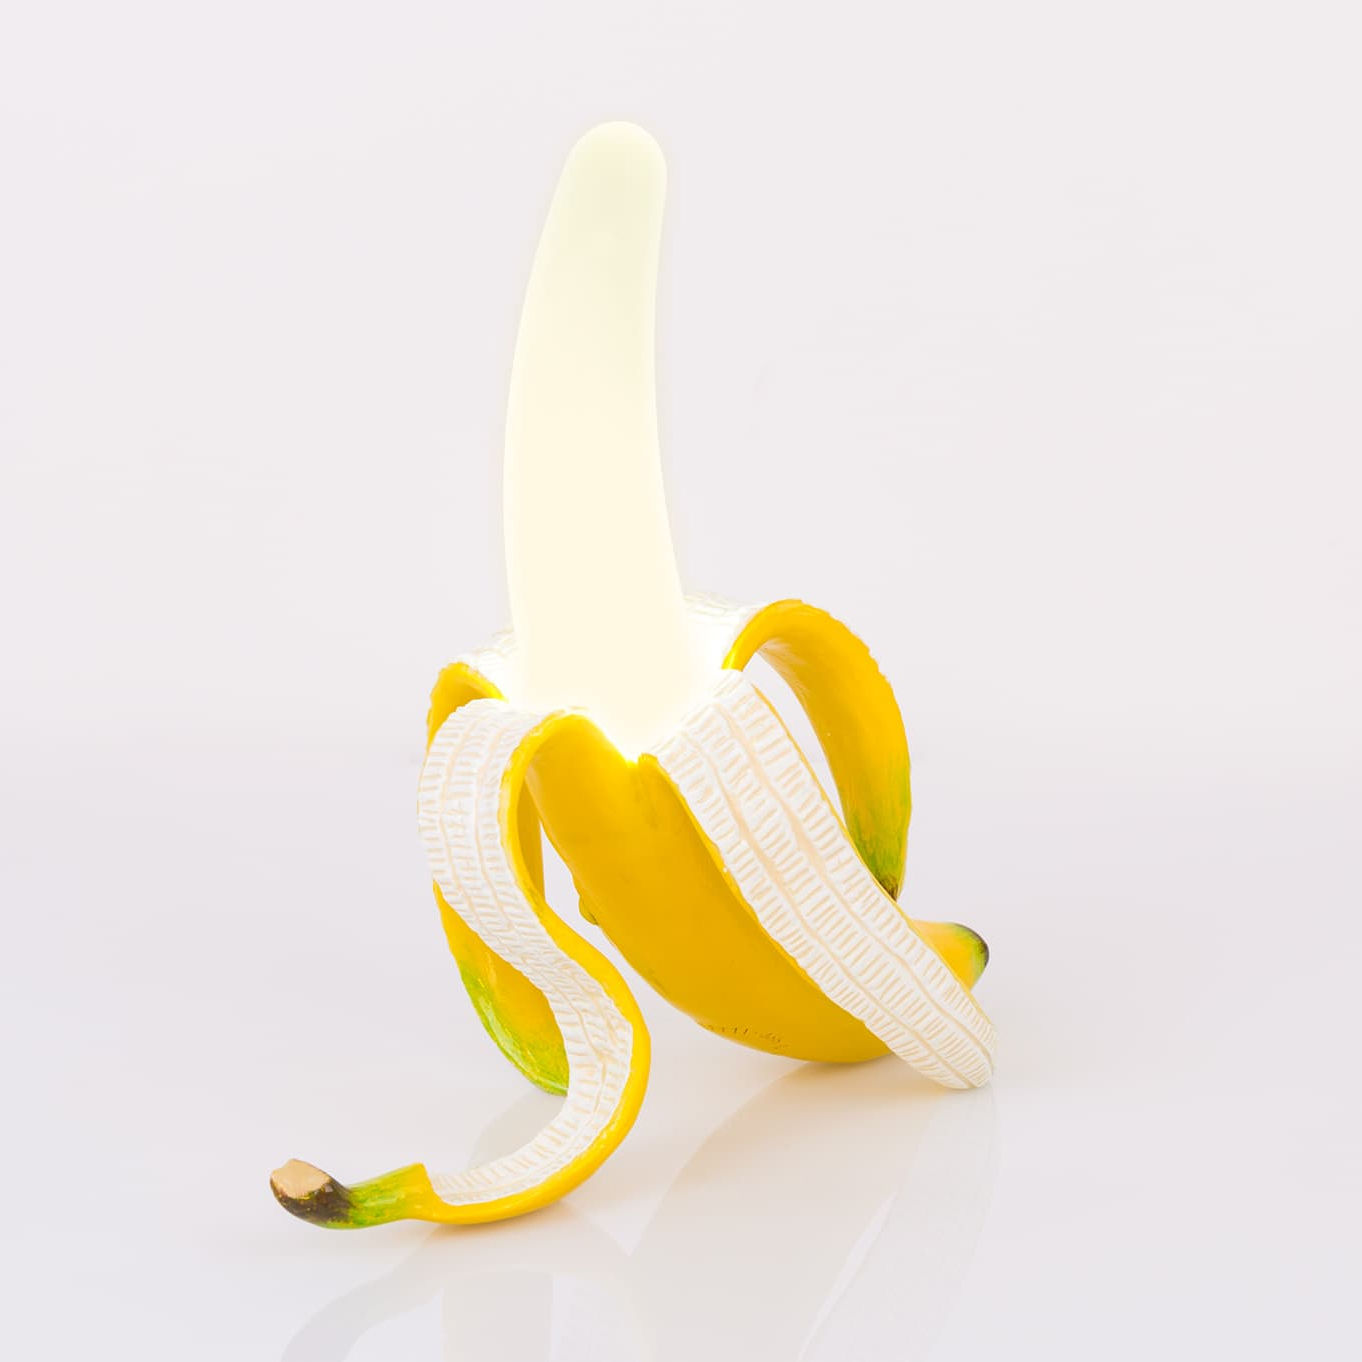 lampe ohne kabel banana daisy von seletti gl nsebl mchen gelb wei l 26 x l 15 x h 30. Black Bedroom Furniture Sets. Home Design Ideas